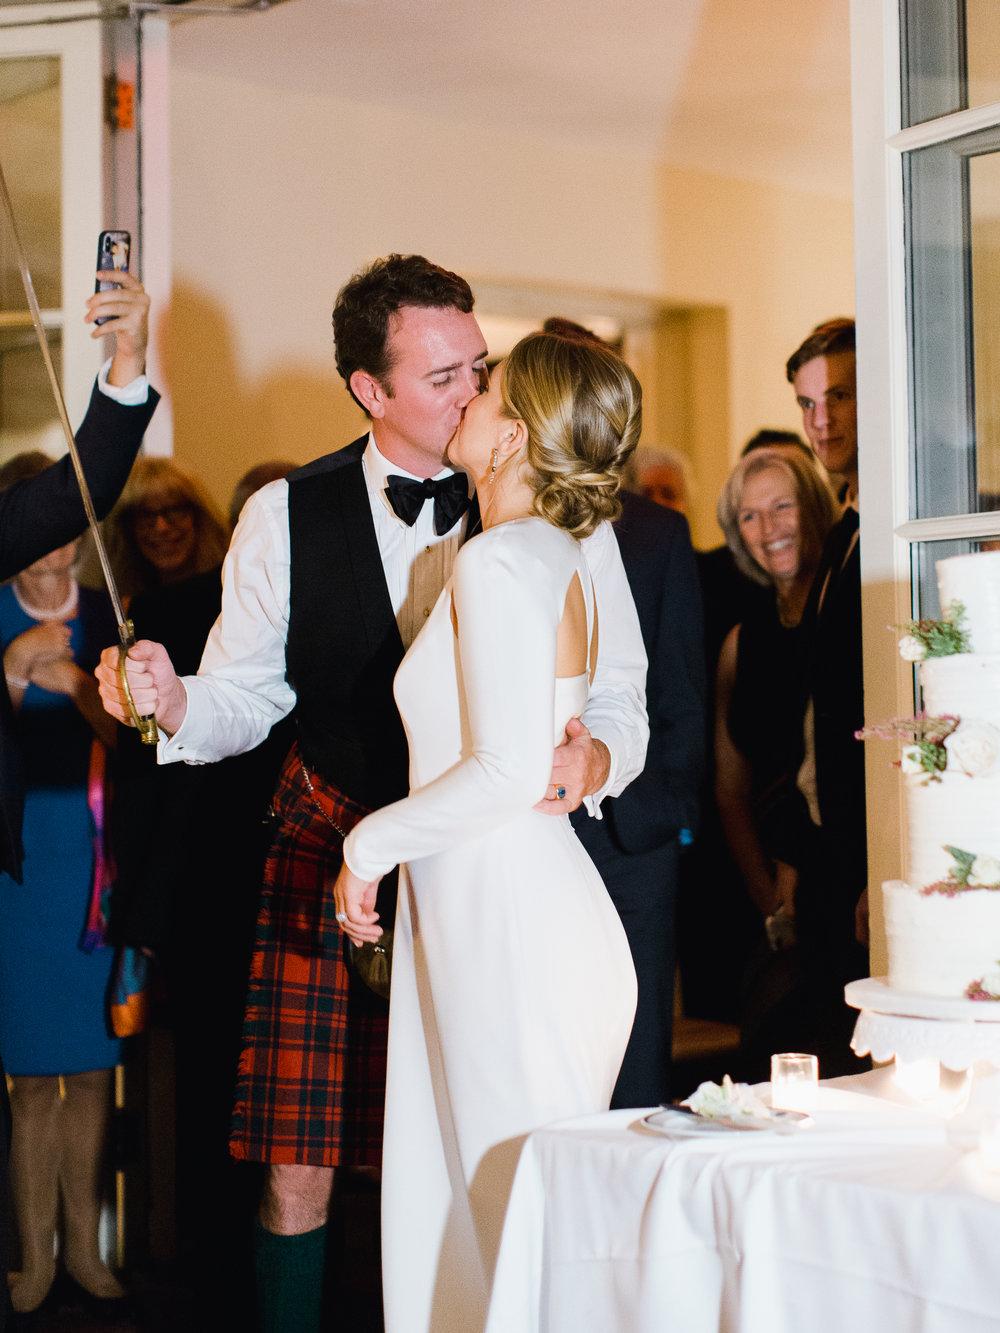 0808-Geneva-Ian-Wedding-Toronto Golf Club-When He Found Her-TorontoPhotographer.jpg